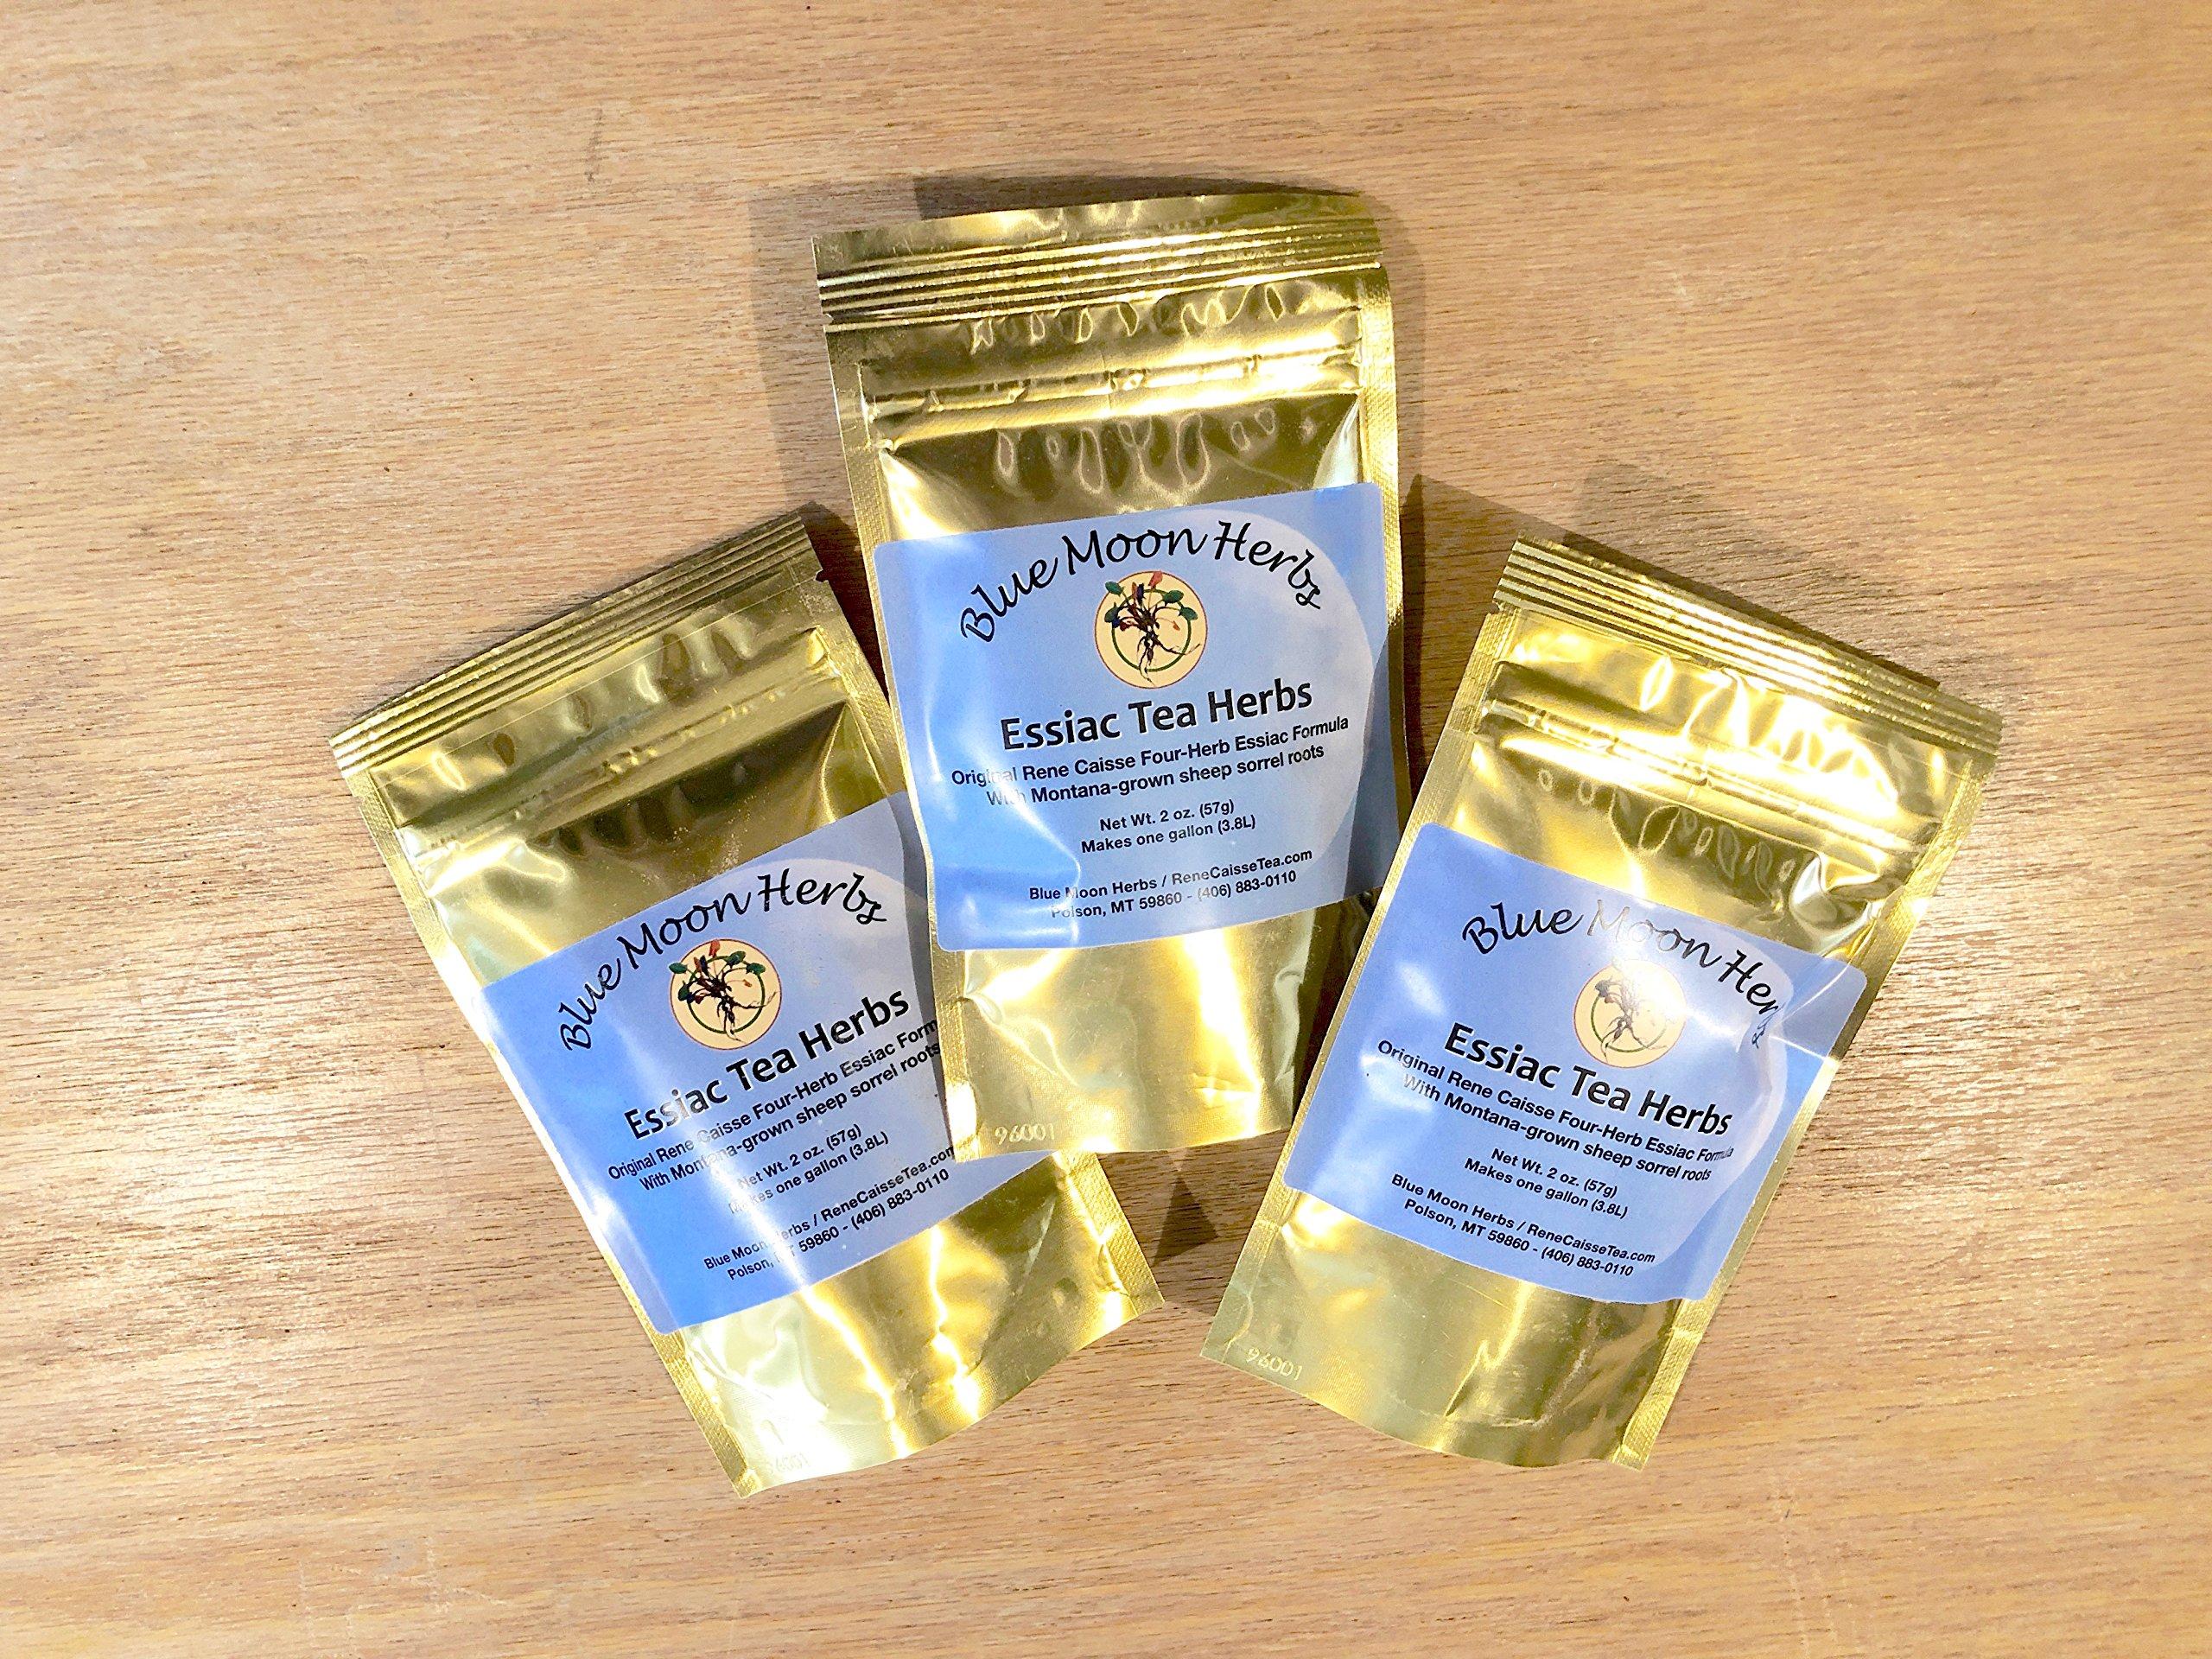 Three-Pack 2 oz. Essiac Tea Herbs Organic with Sheep Sorrel Content 25% Root - 6 oz. Total